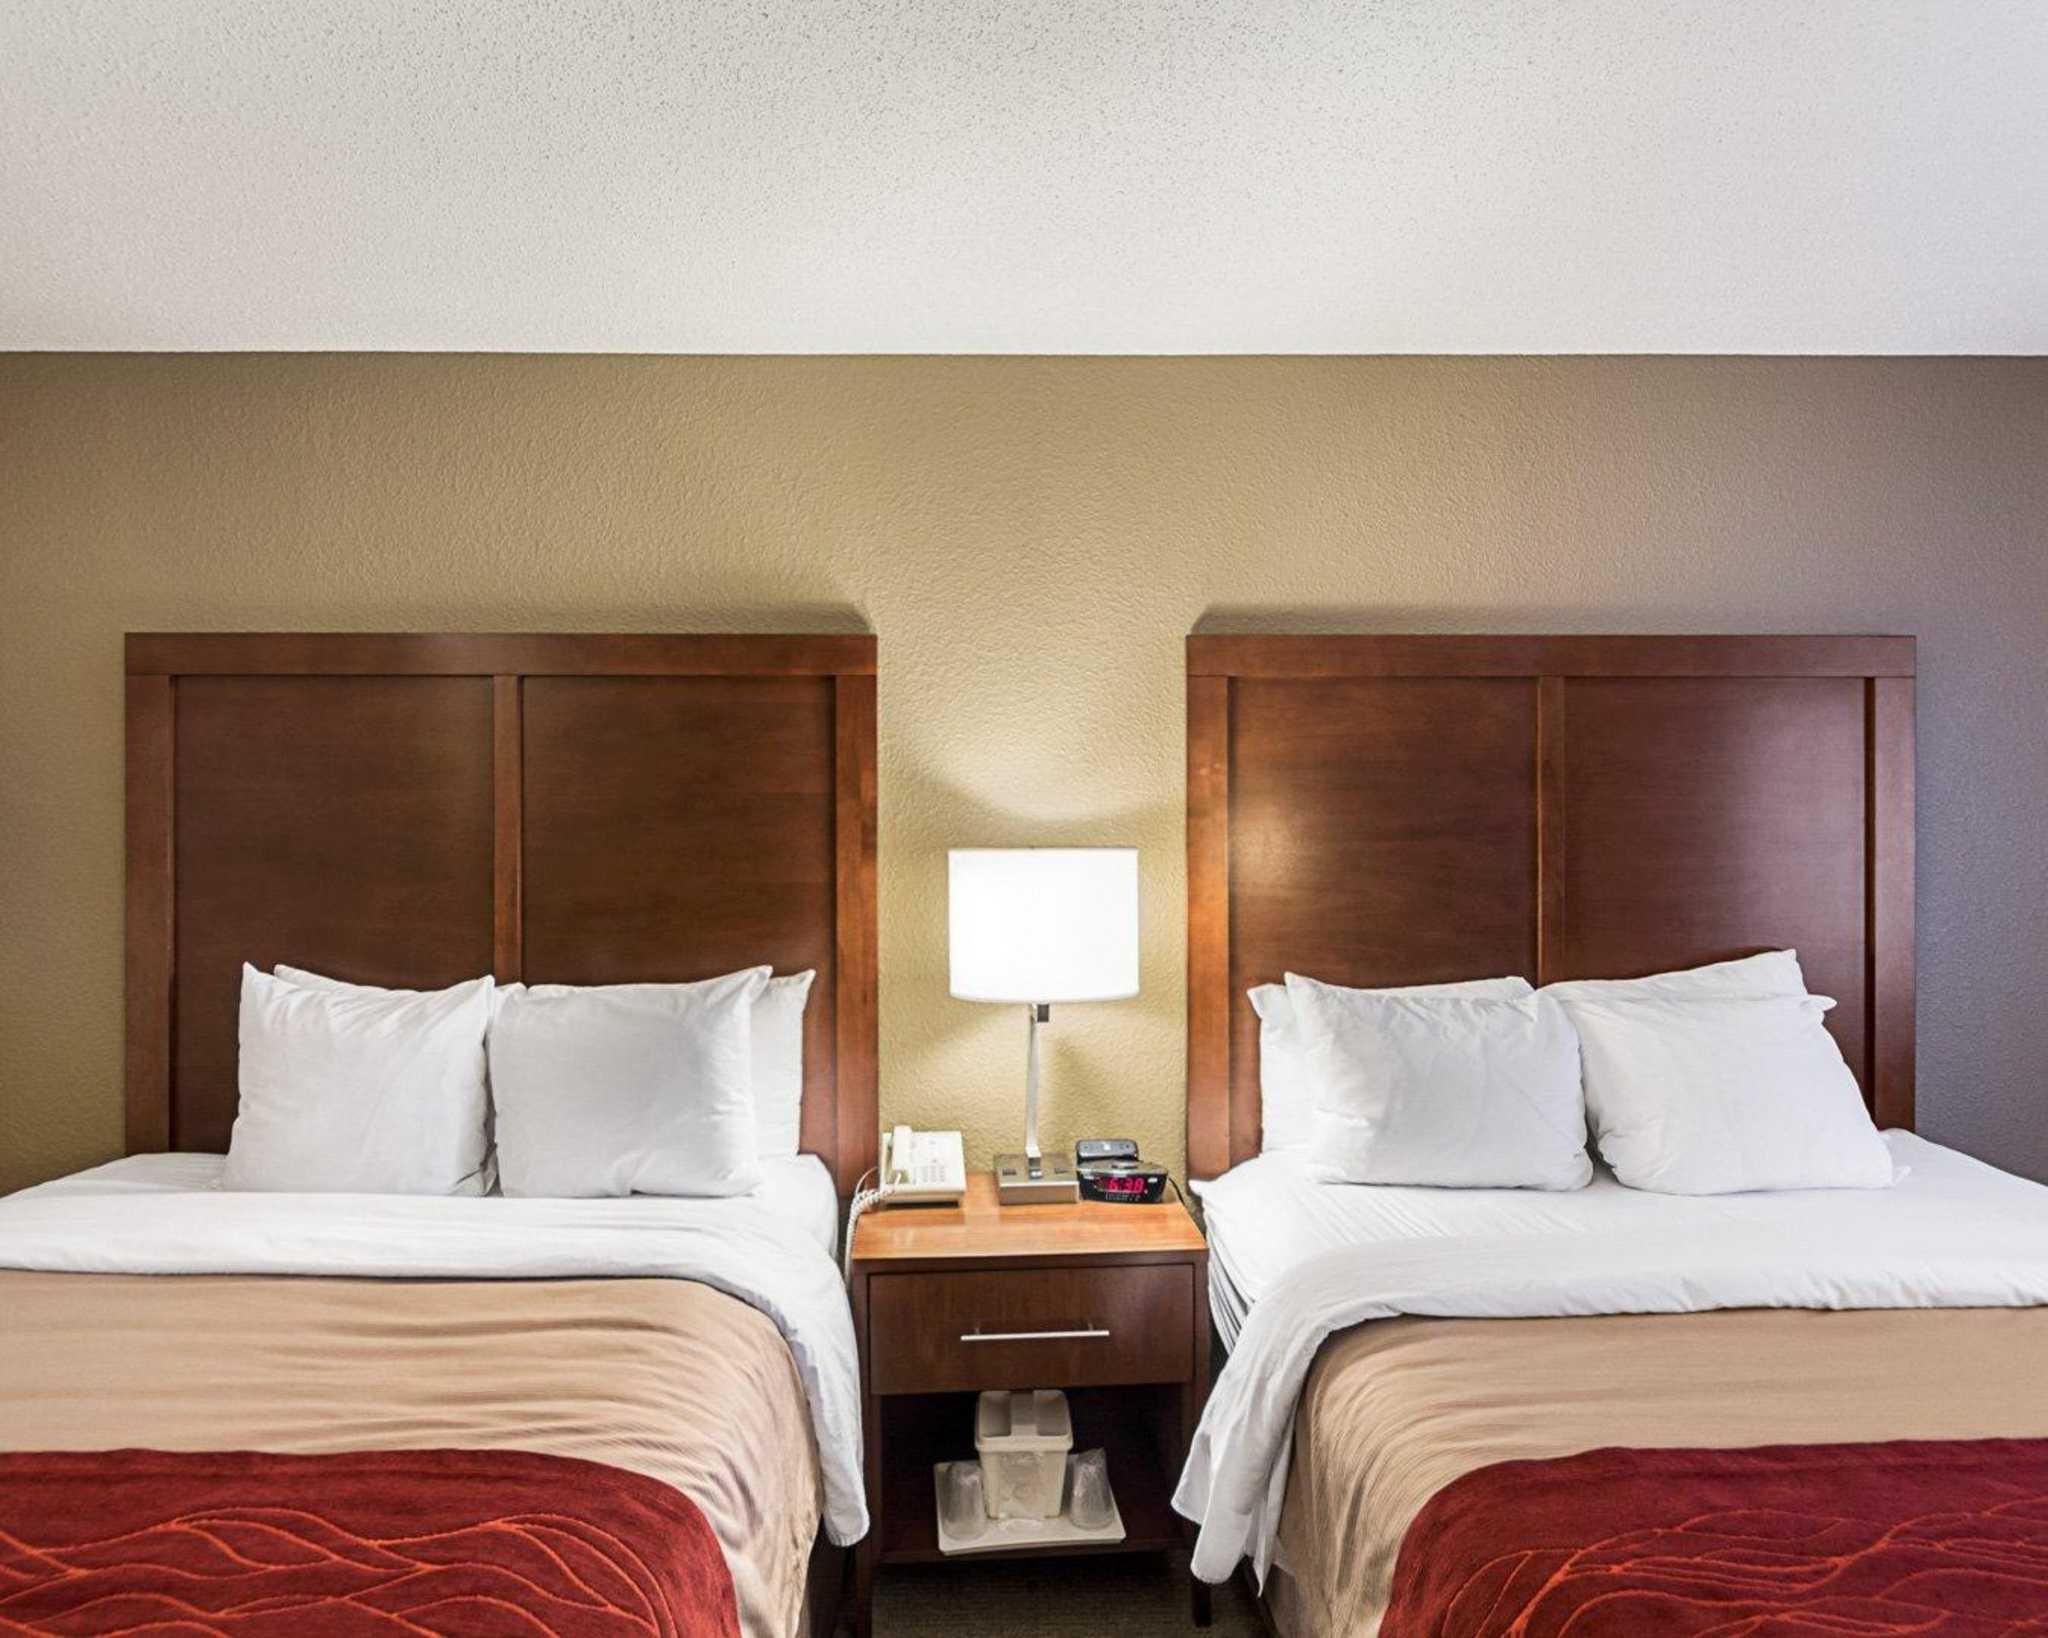 Comfort Inn East image 7